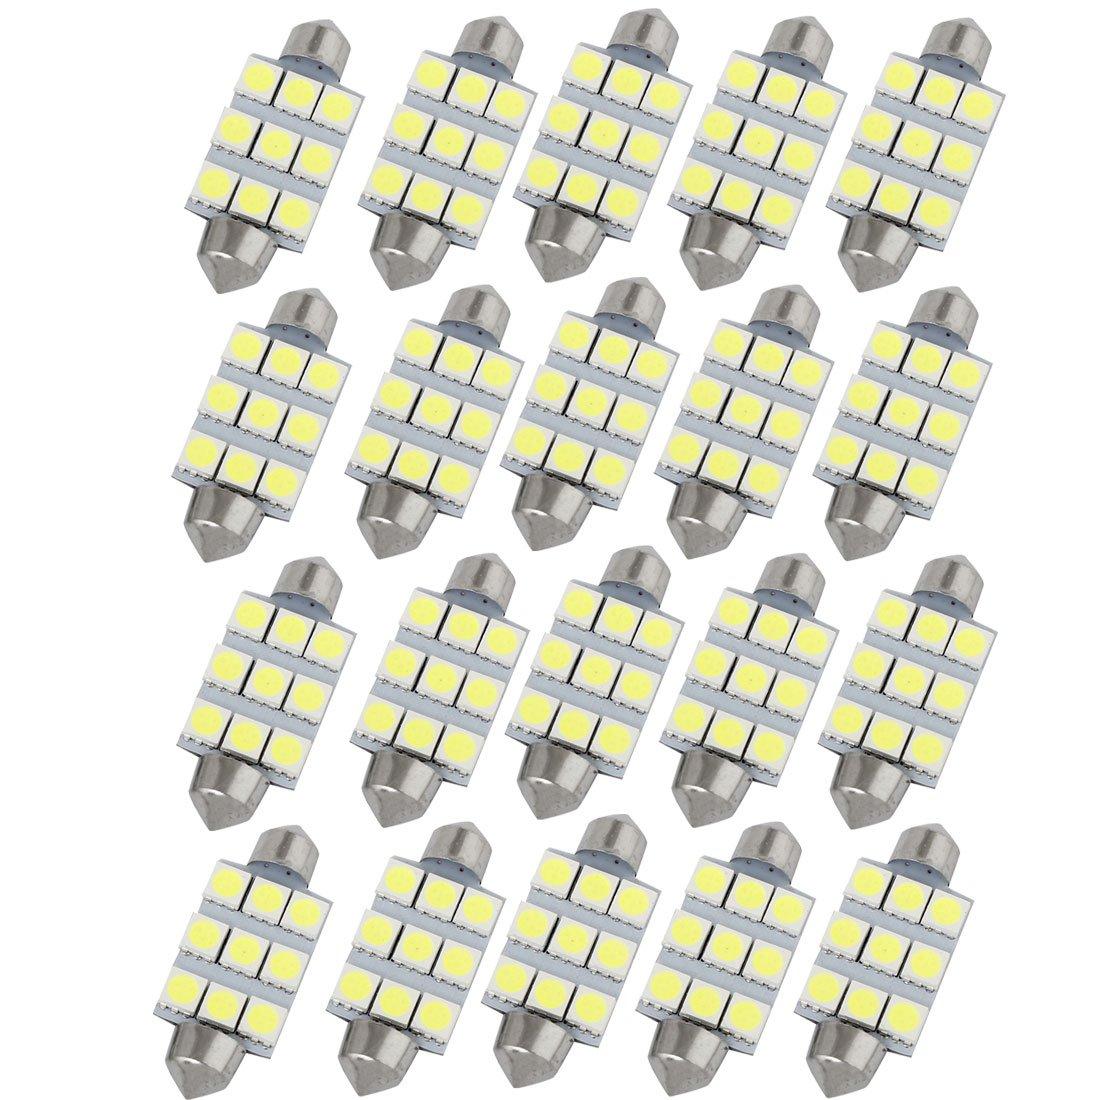 2 White LED Bulbs 41mm Festoon 9-SMD 5050 Dome Map Trunk Light